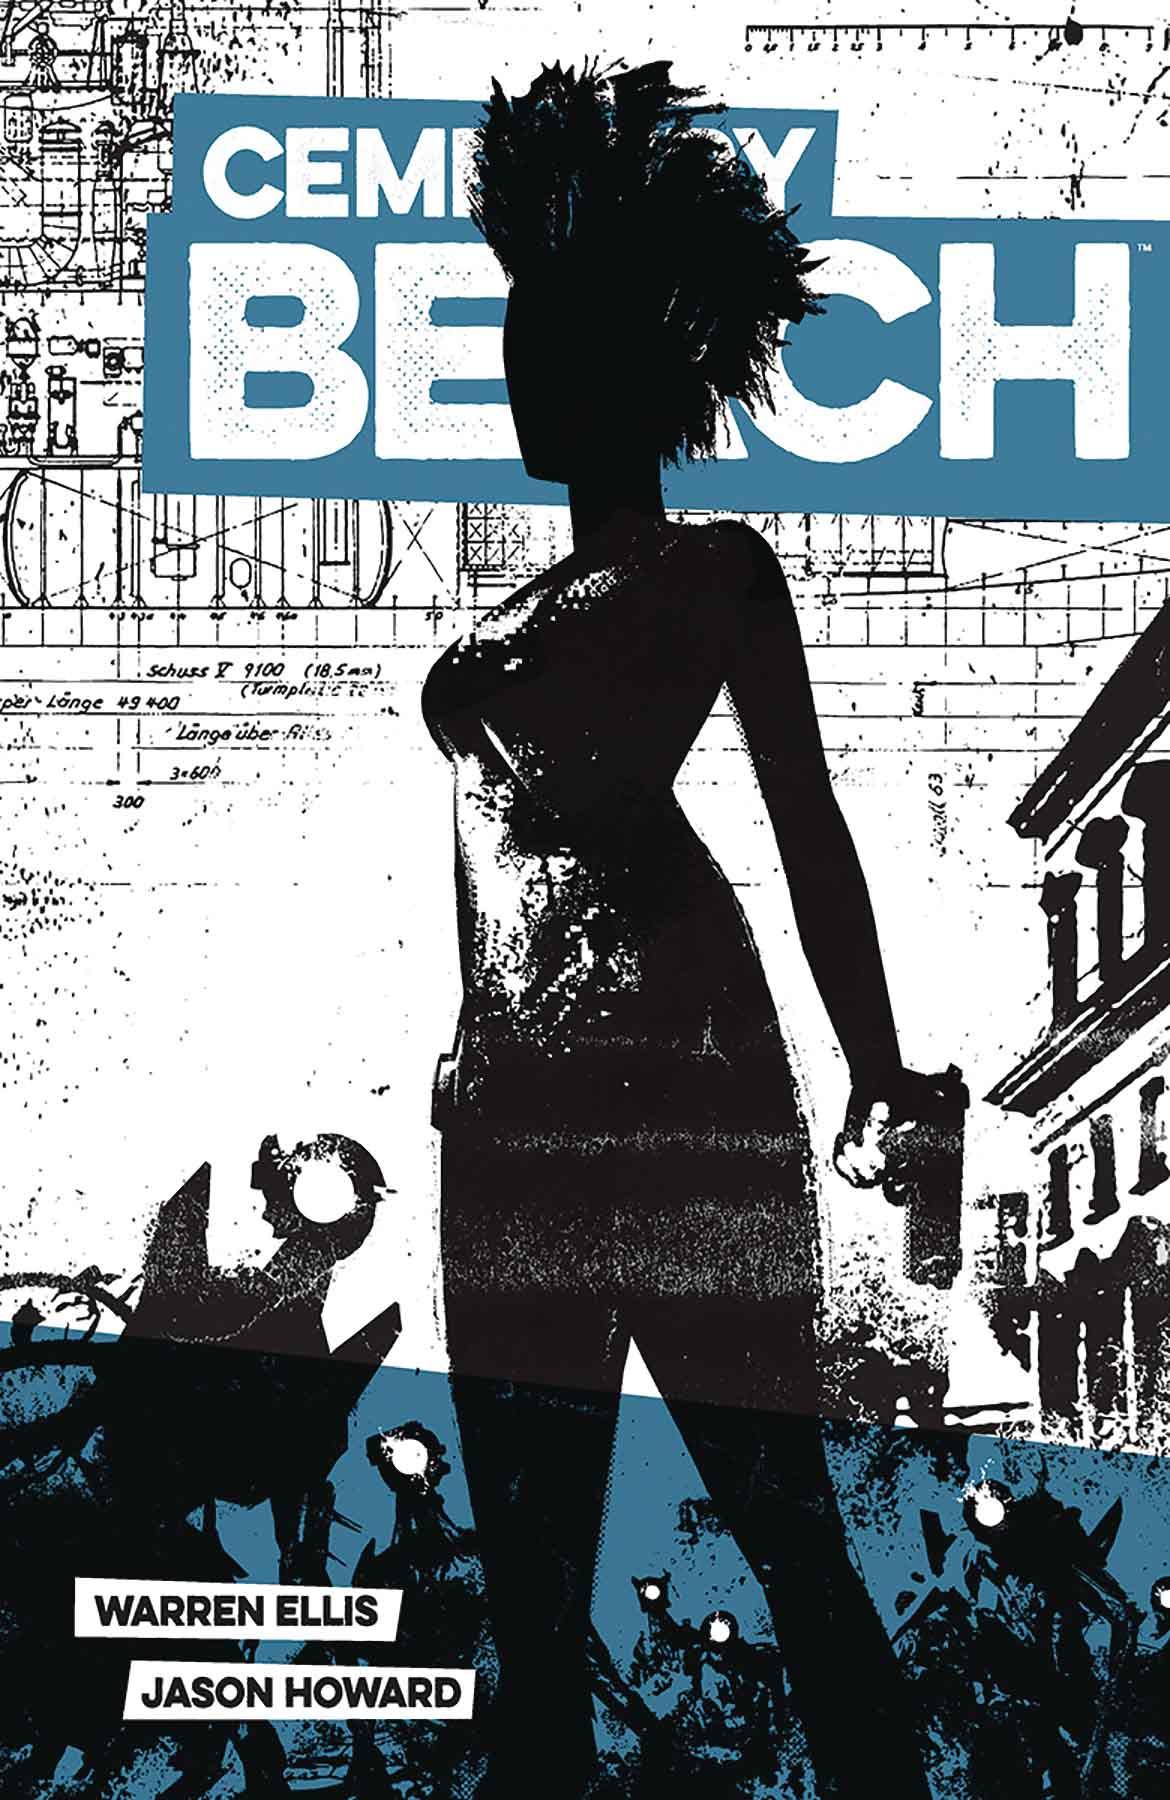 Cemetary Beach